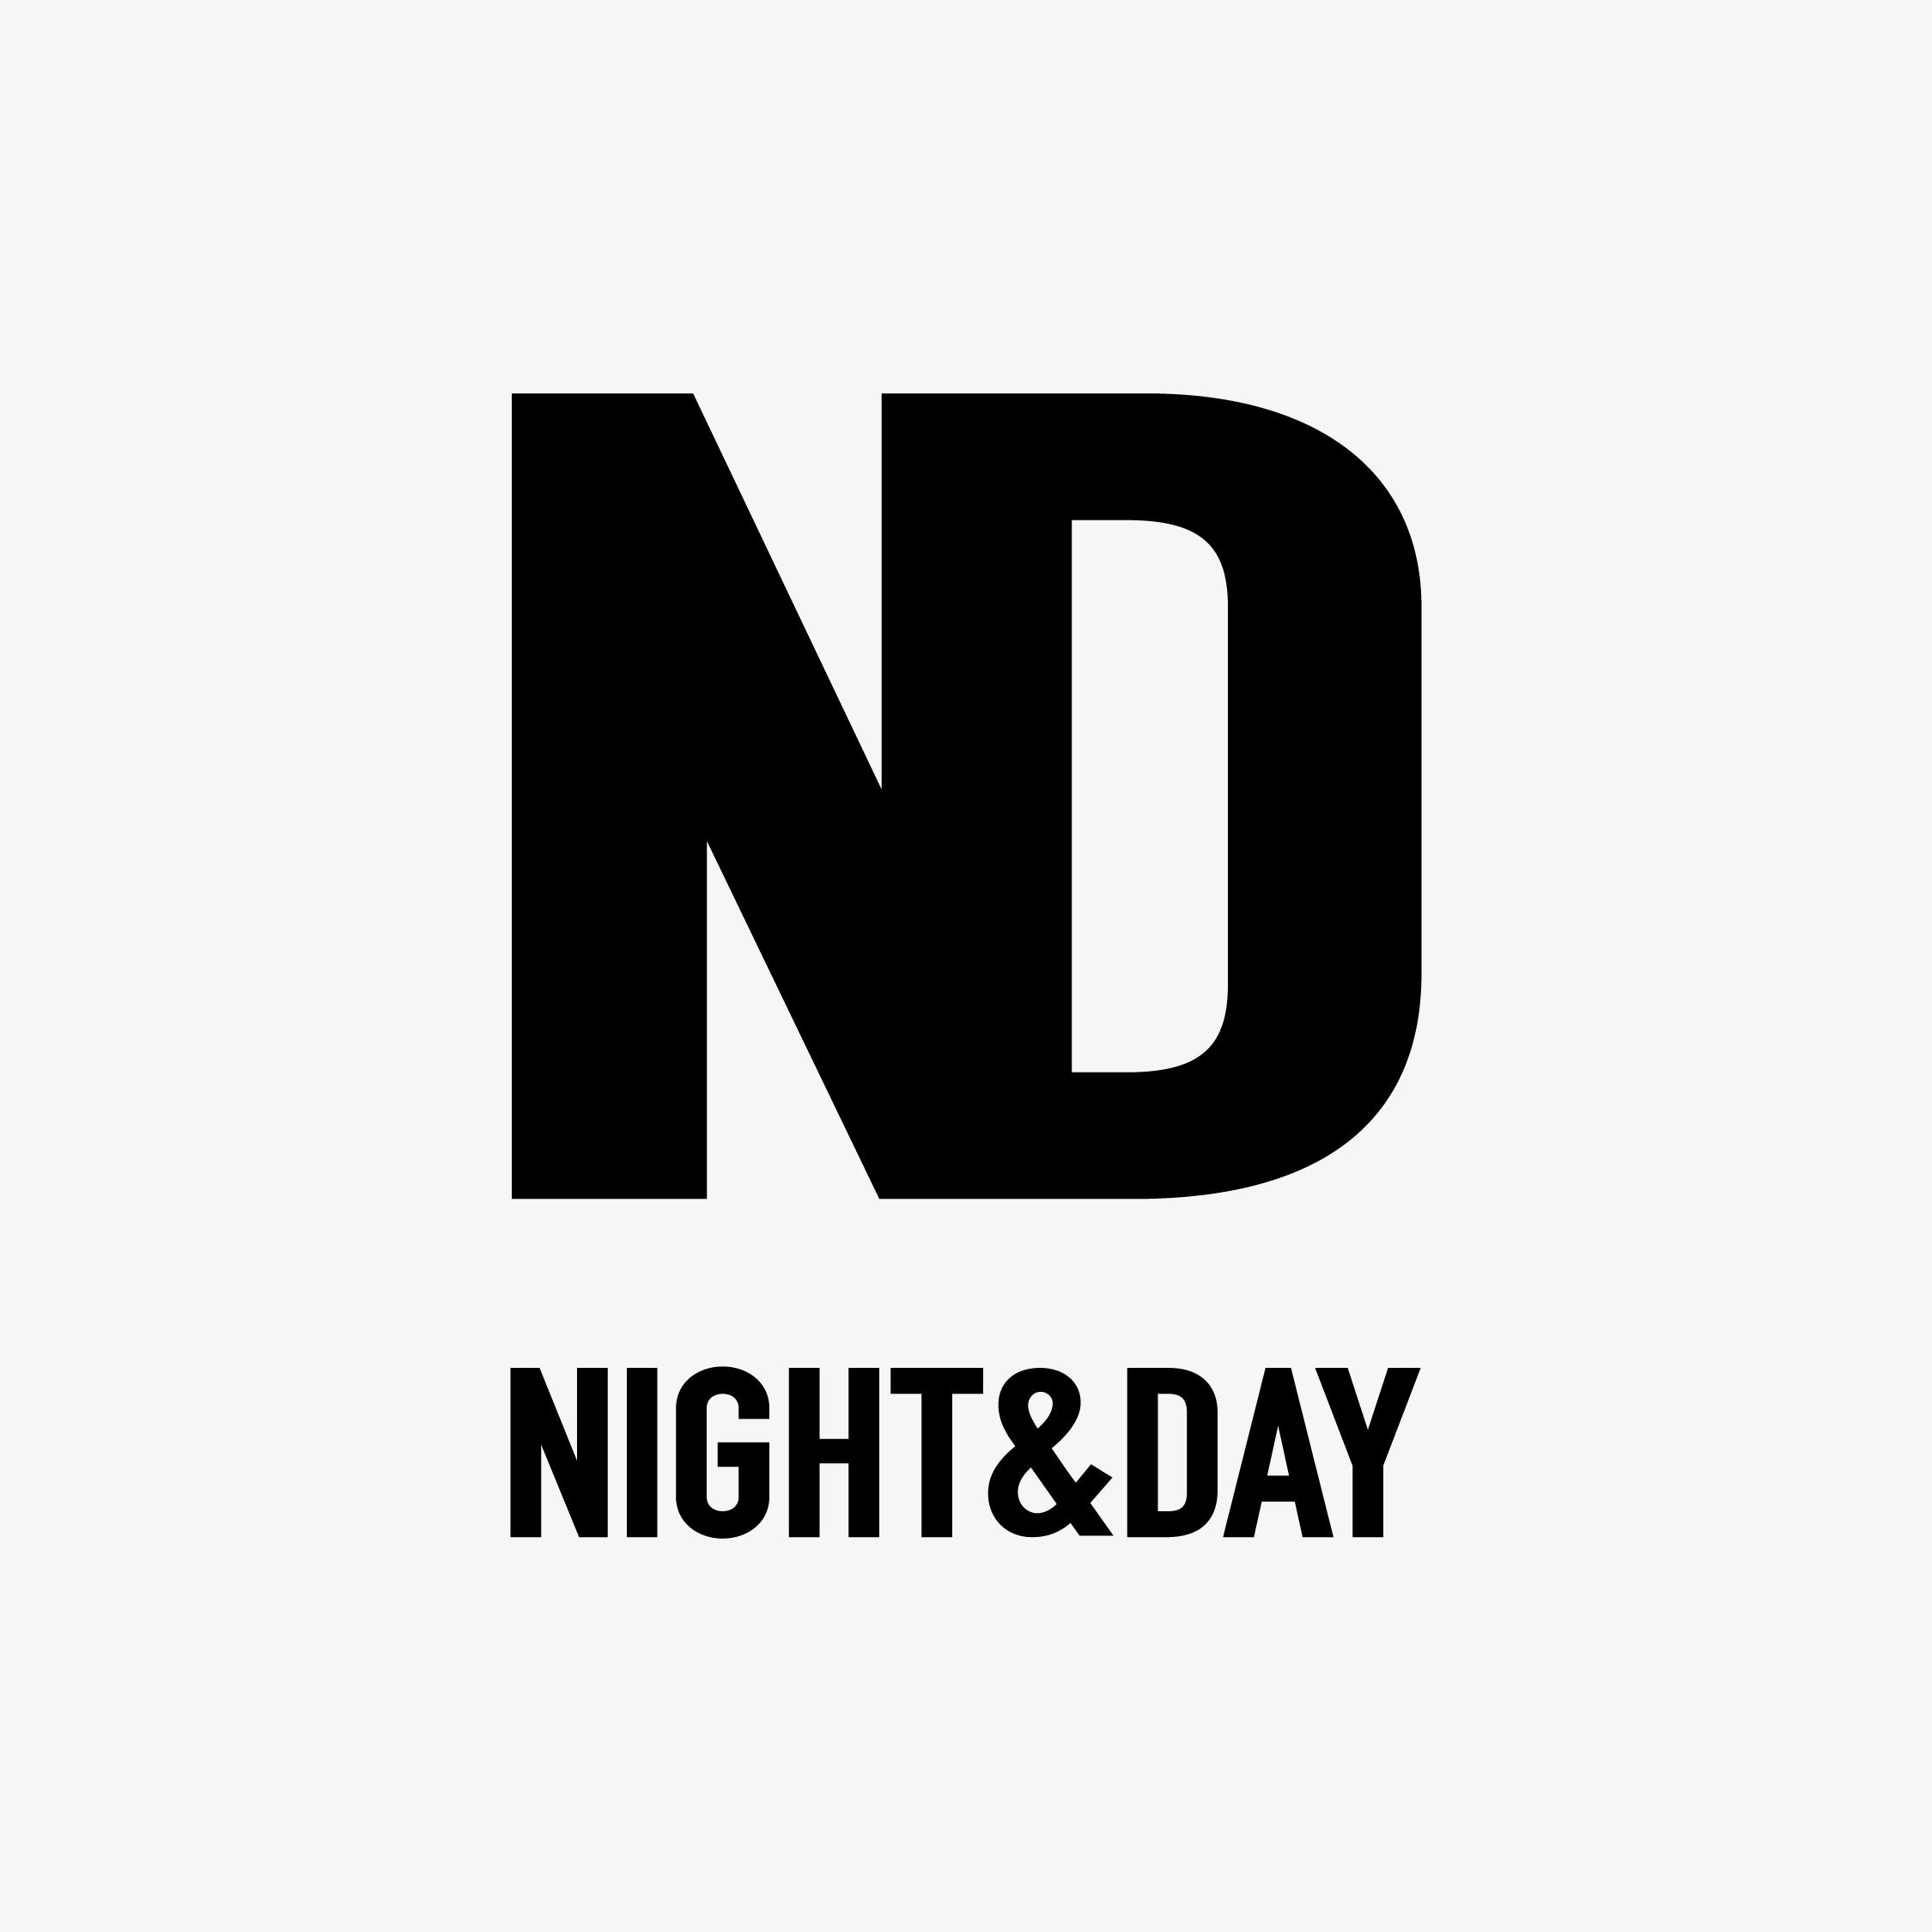 Night&Day, branding, store design, design